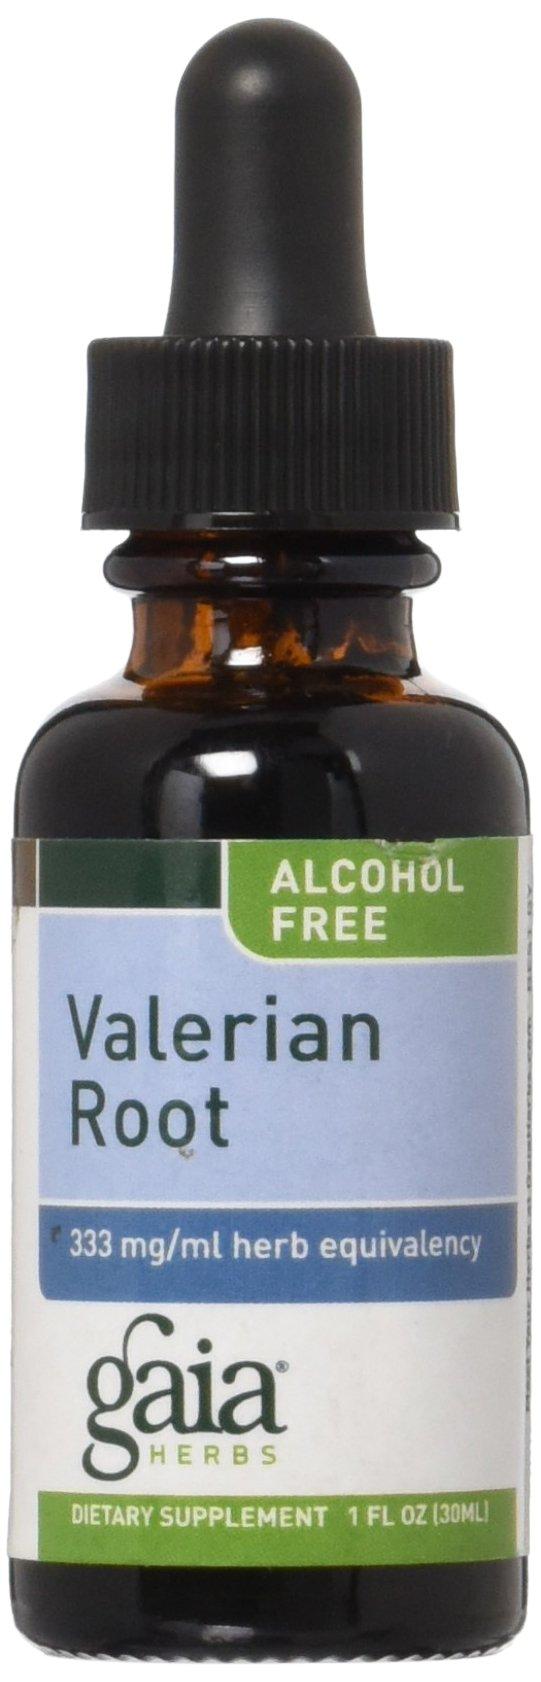 Valerian Root Extract No Alchohol - 1 oz - Liquid